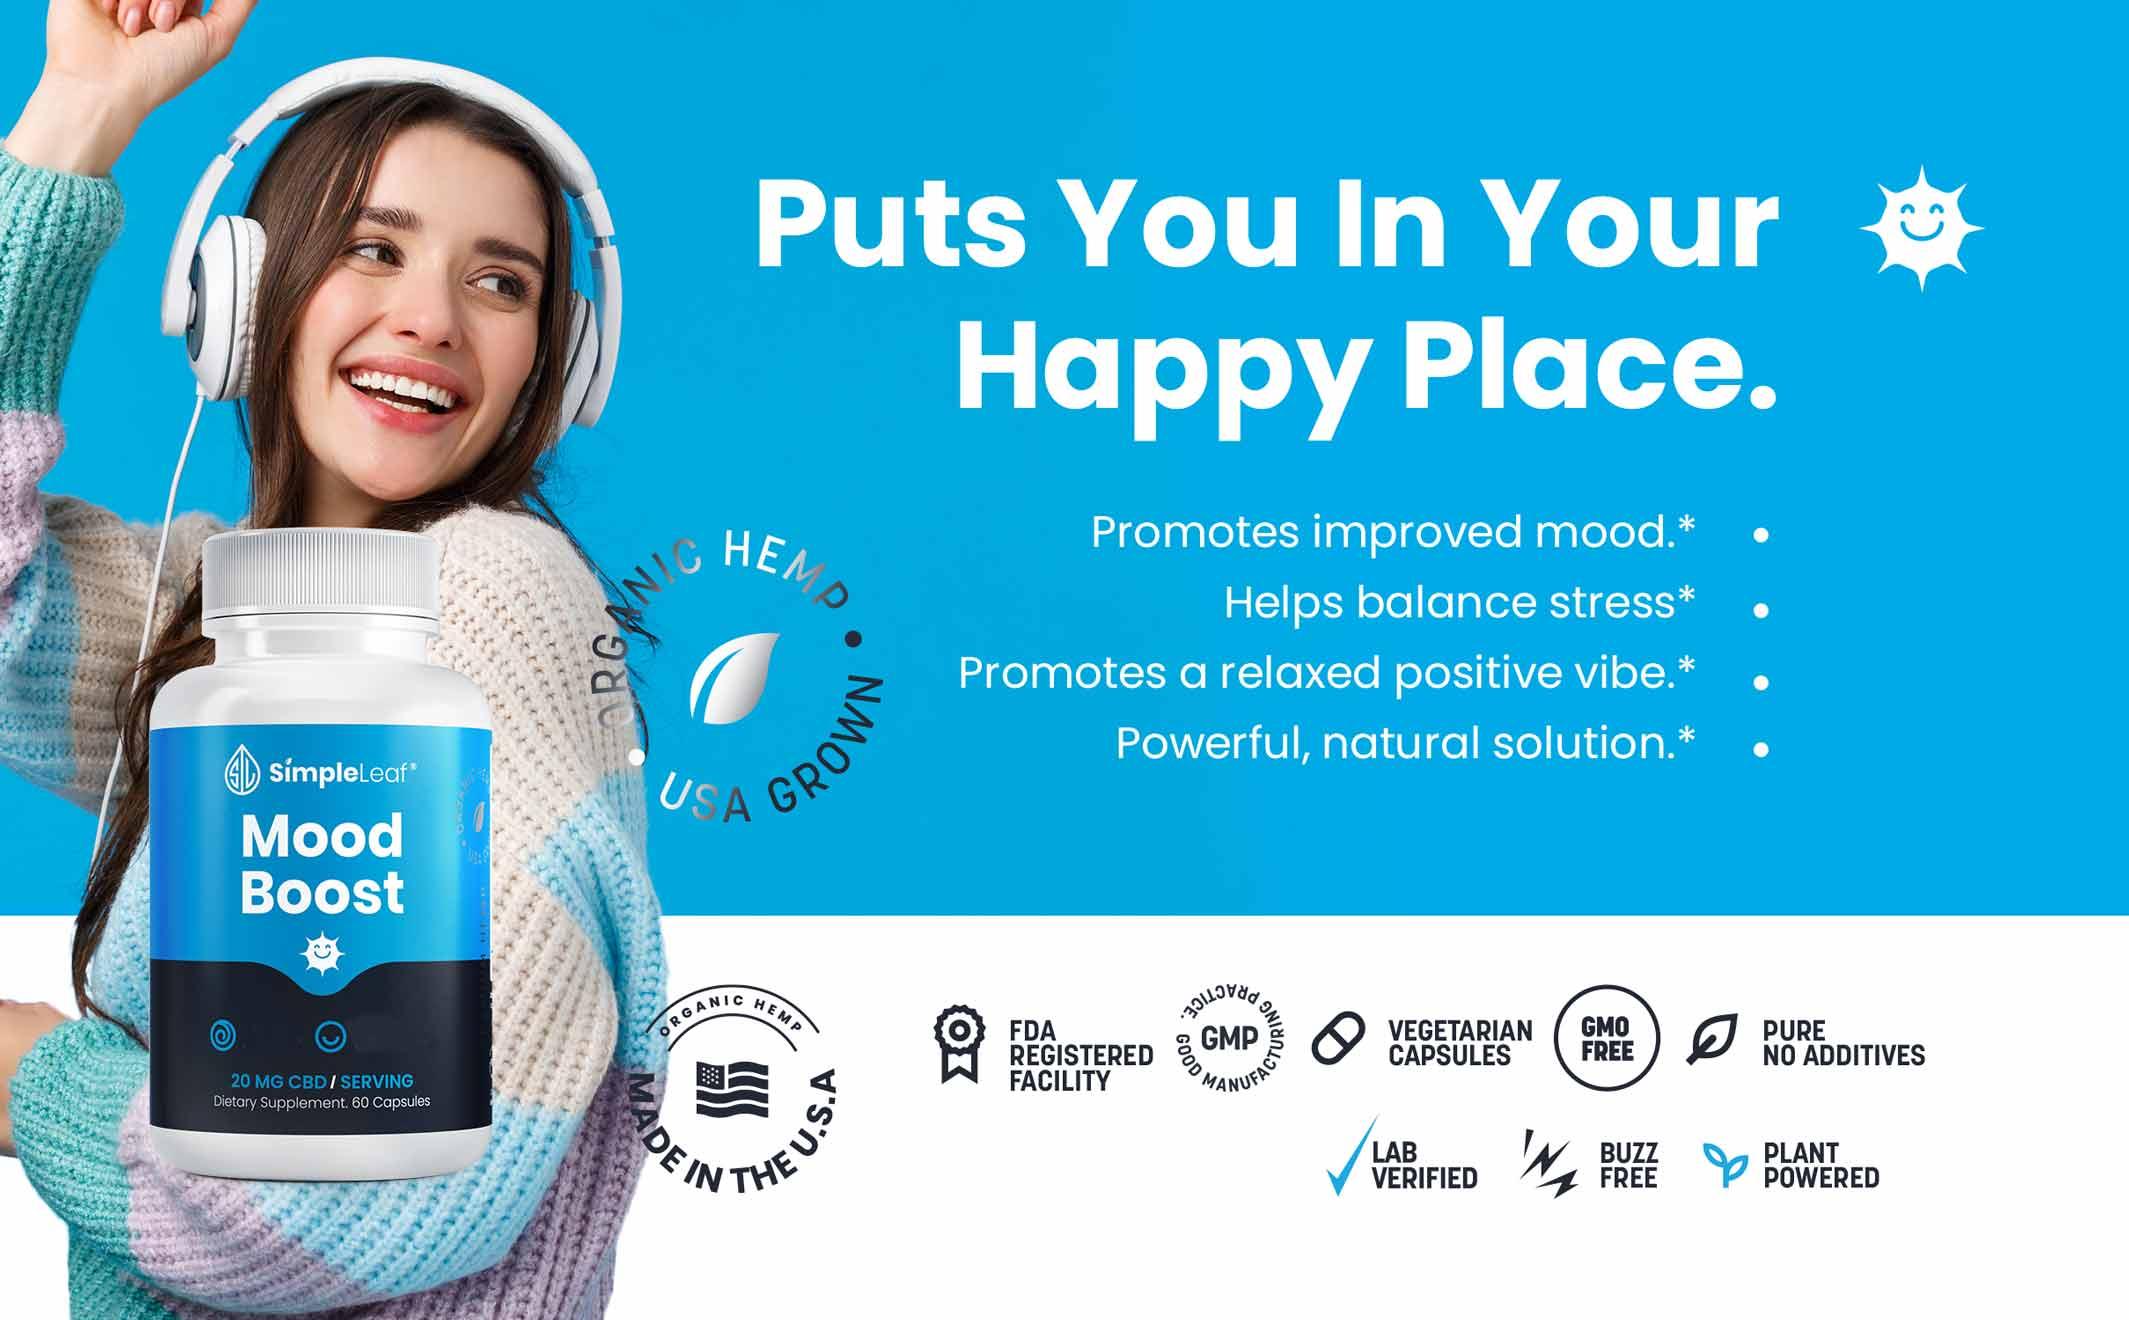 cbd stress, cbd mood boost, cbd capsules for stress